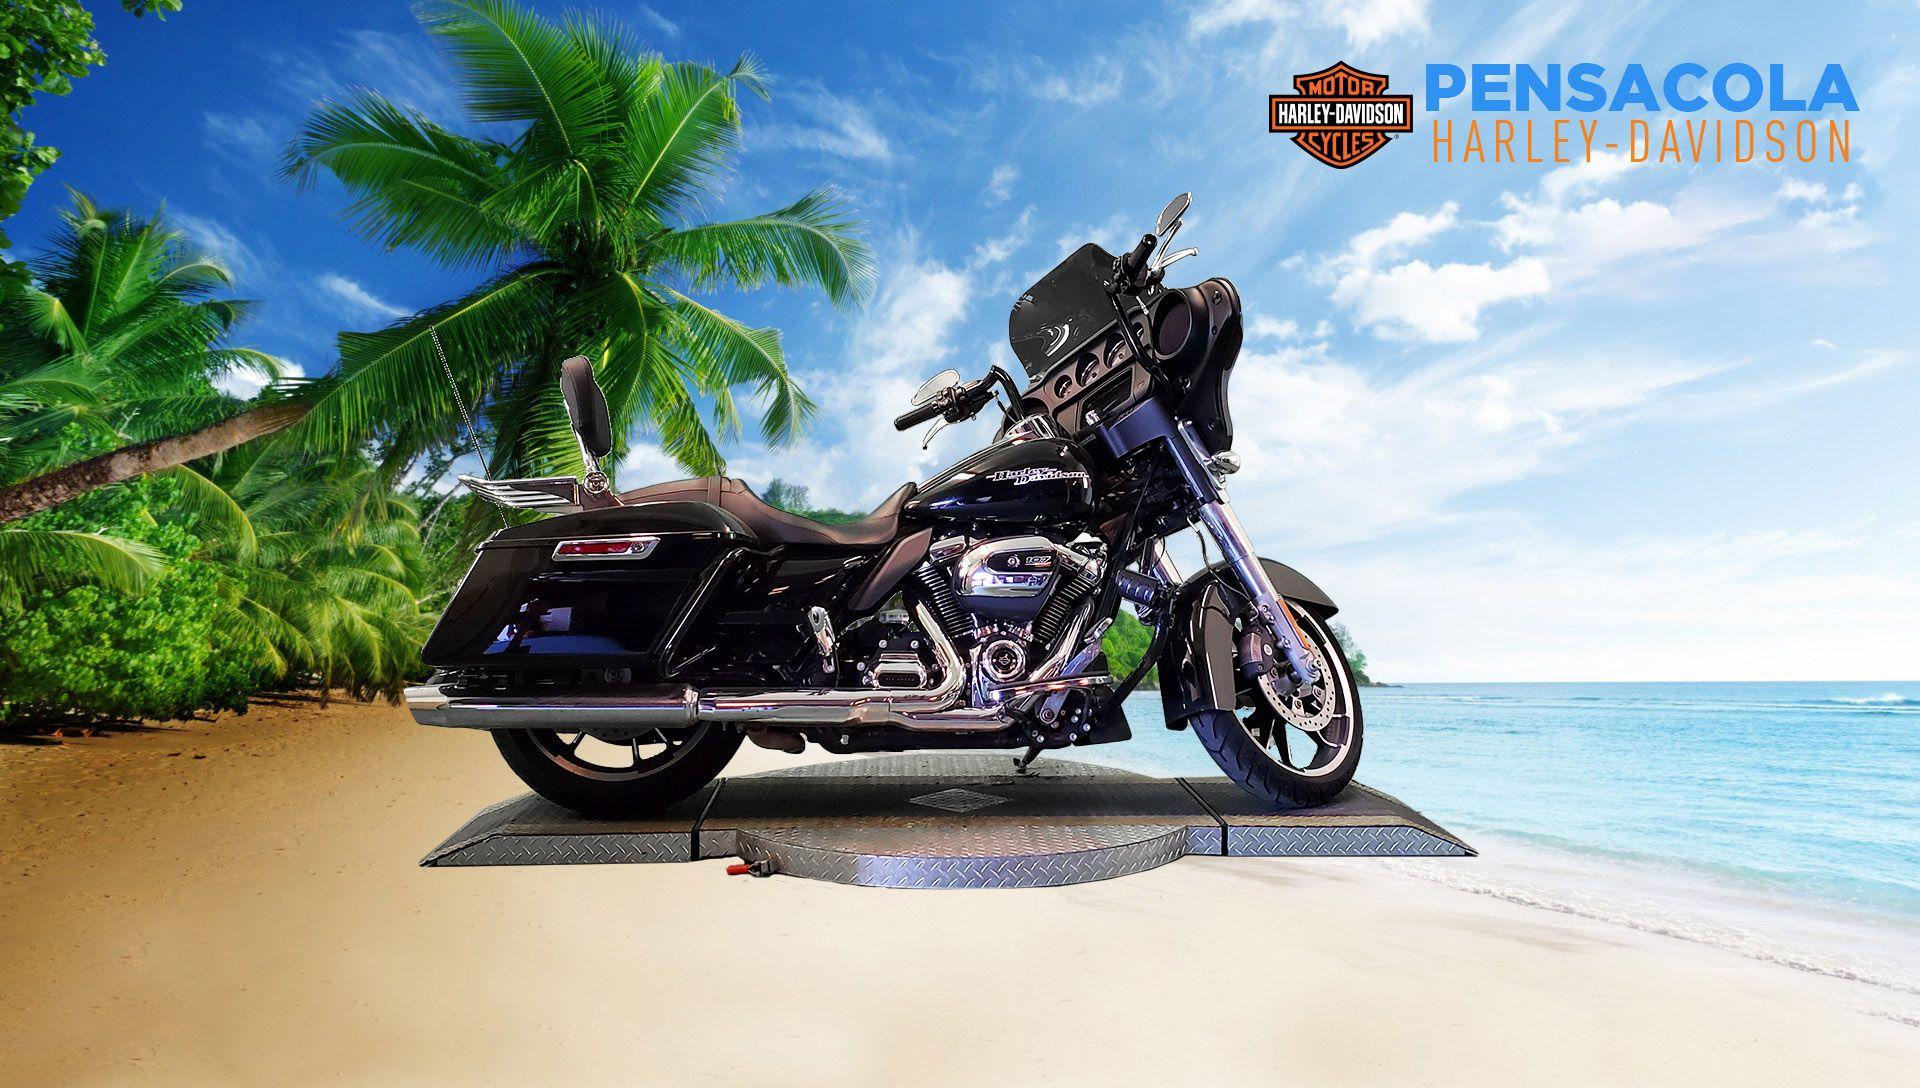 Pre-Owned 2020 Harley-Davidson Street Glide FLHX